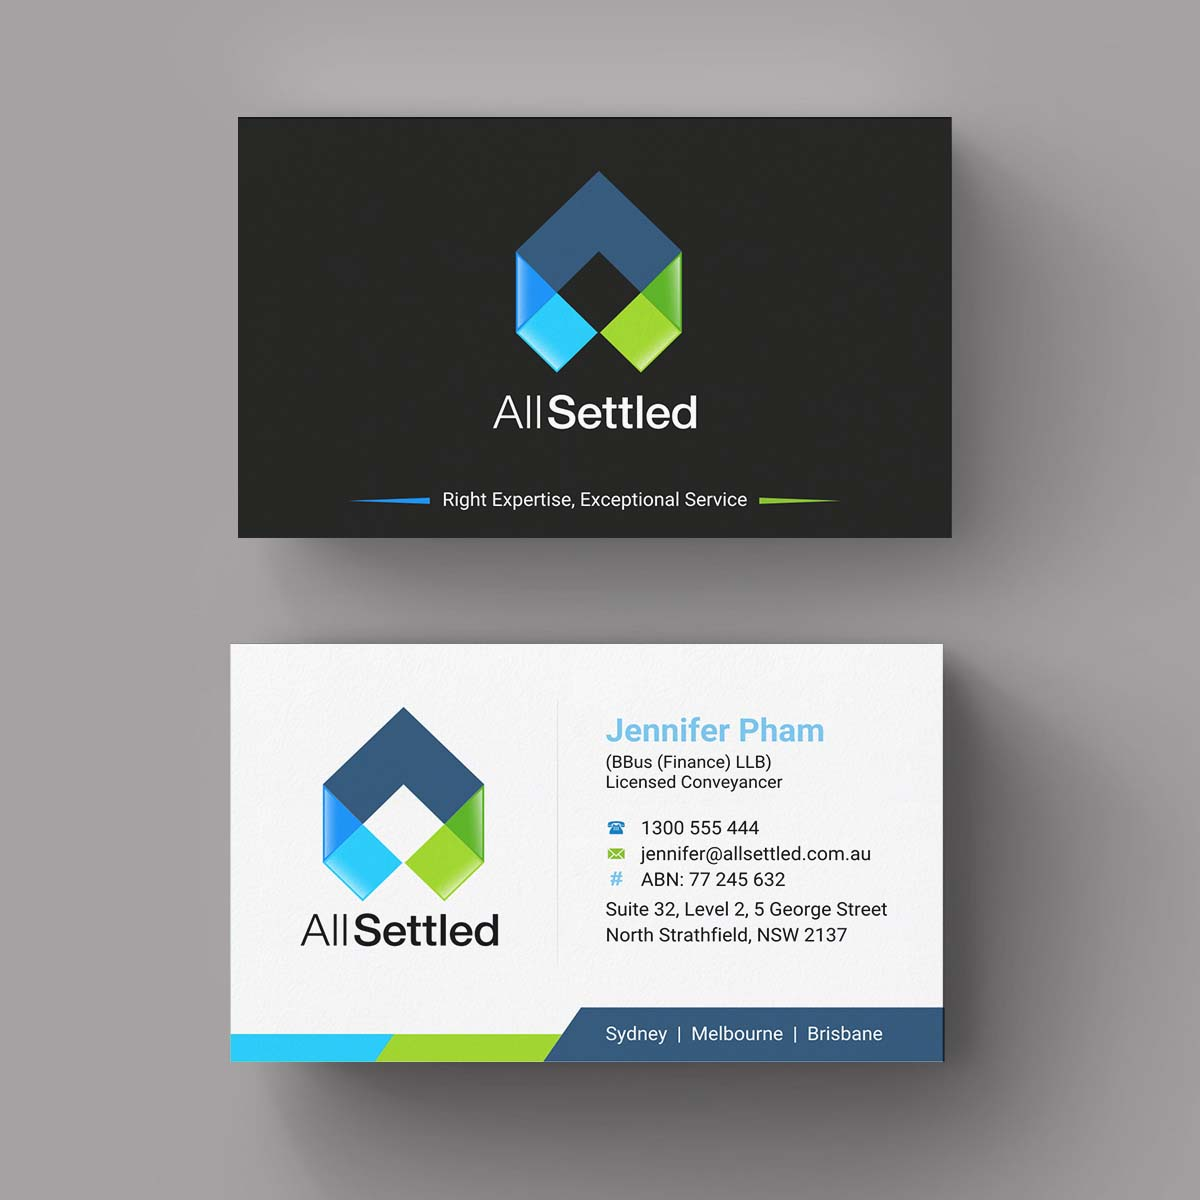 Elegant modern real estate business card design for all settled by business card design by indianashok for all settled design 11300326 reheart Image collections